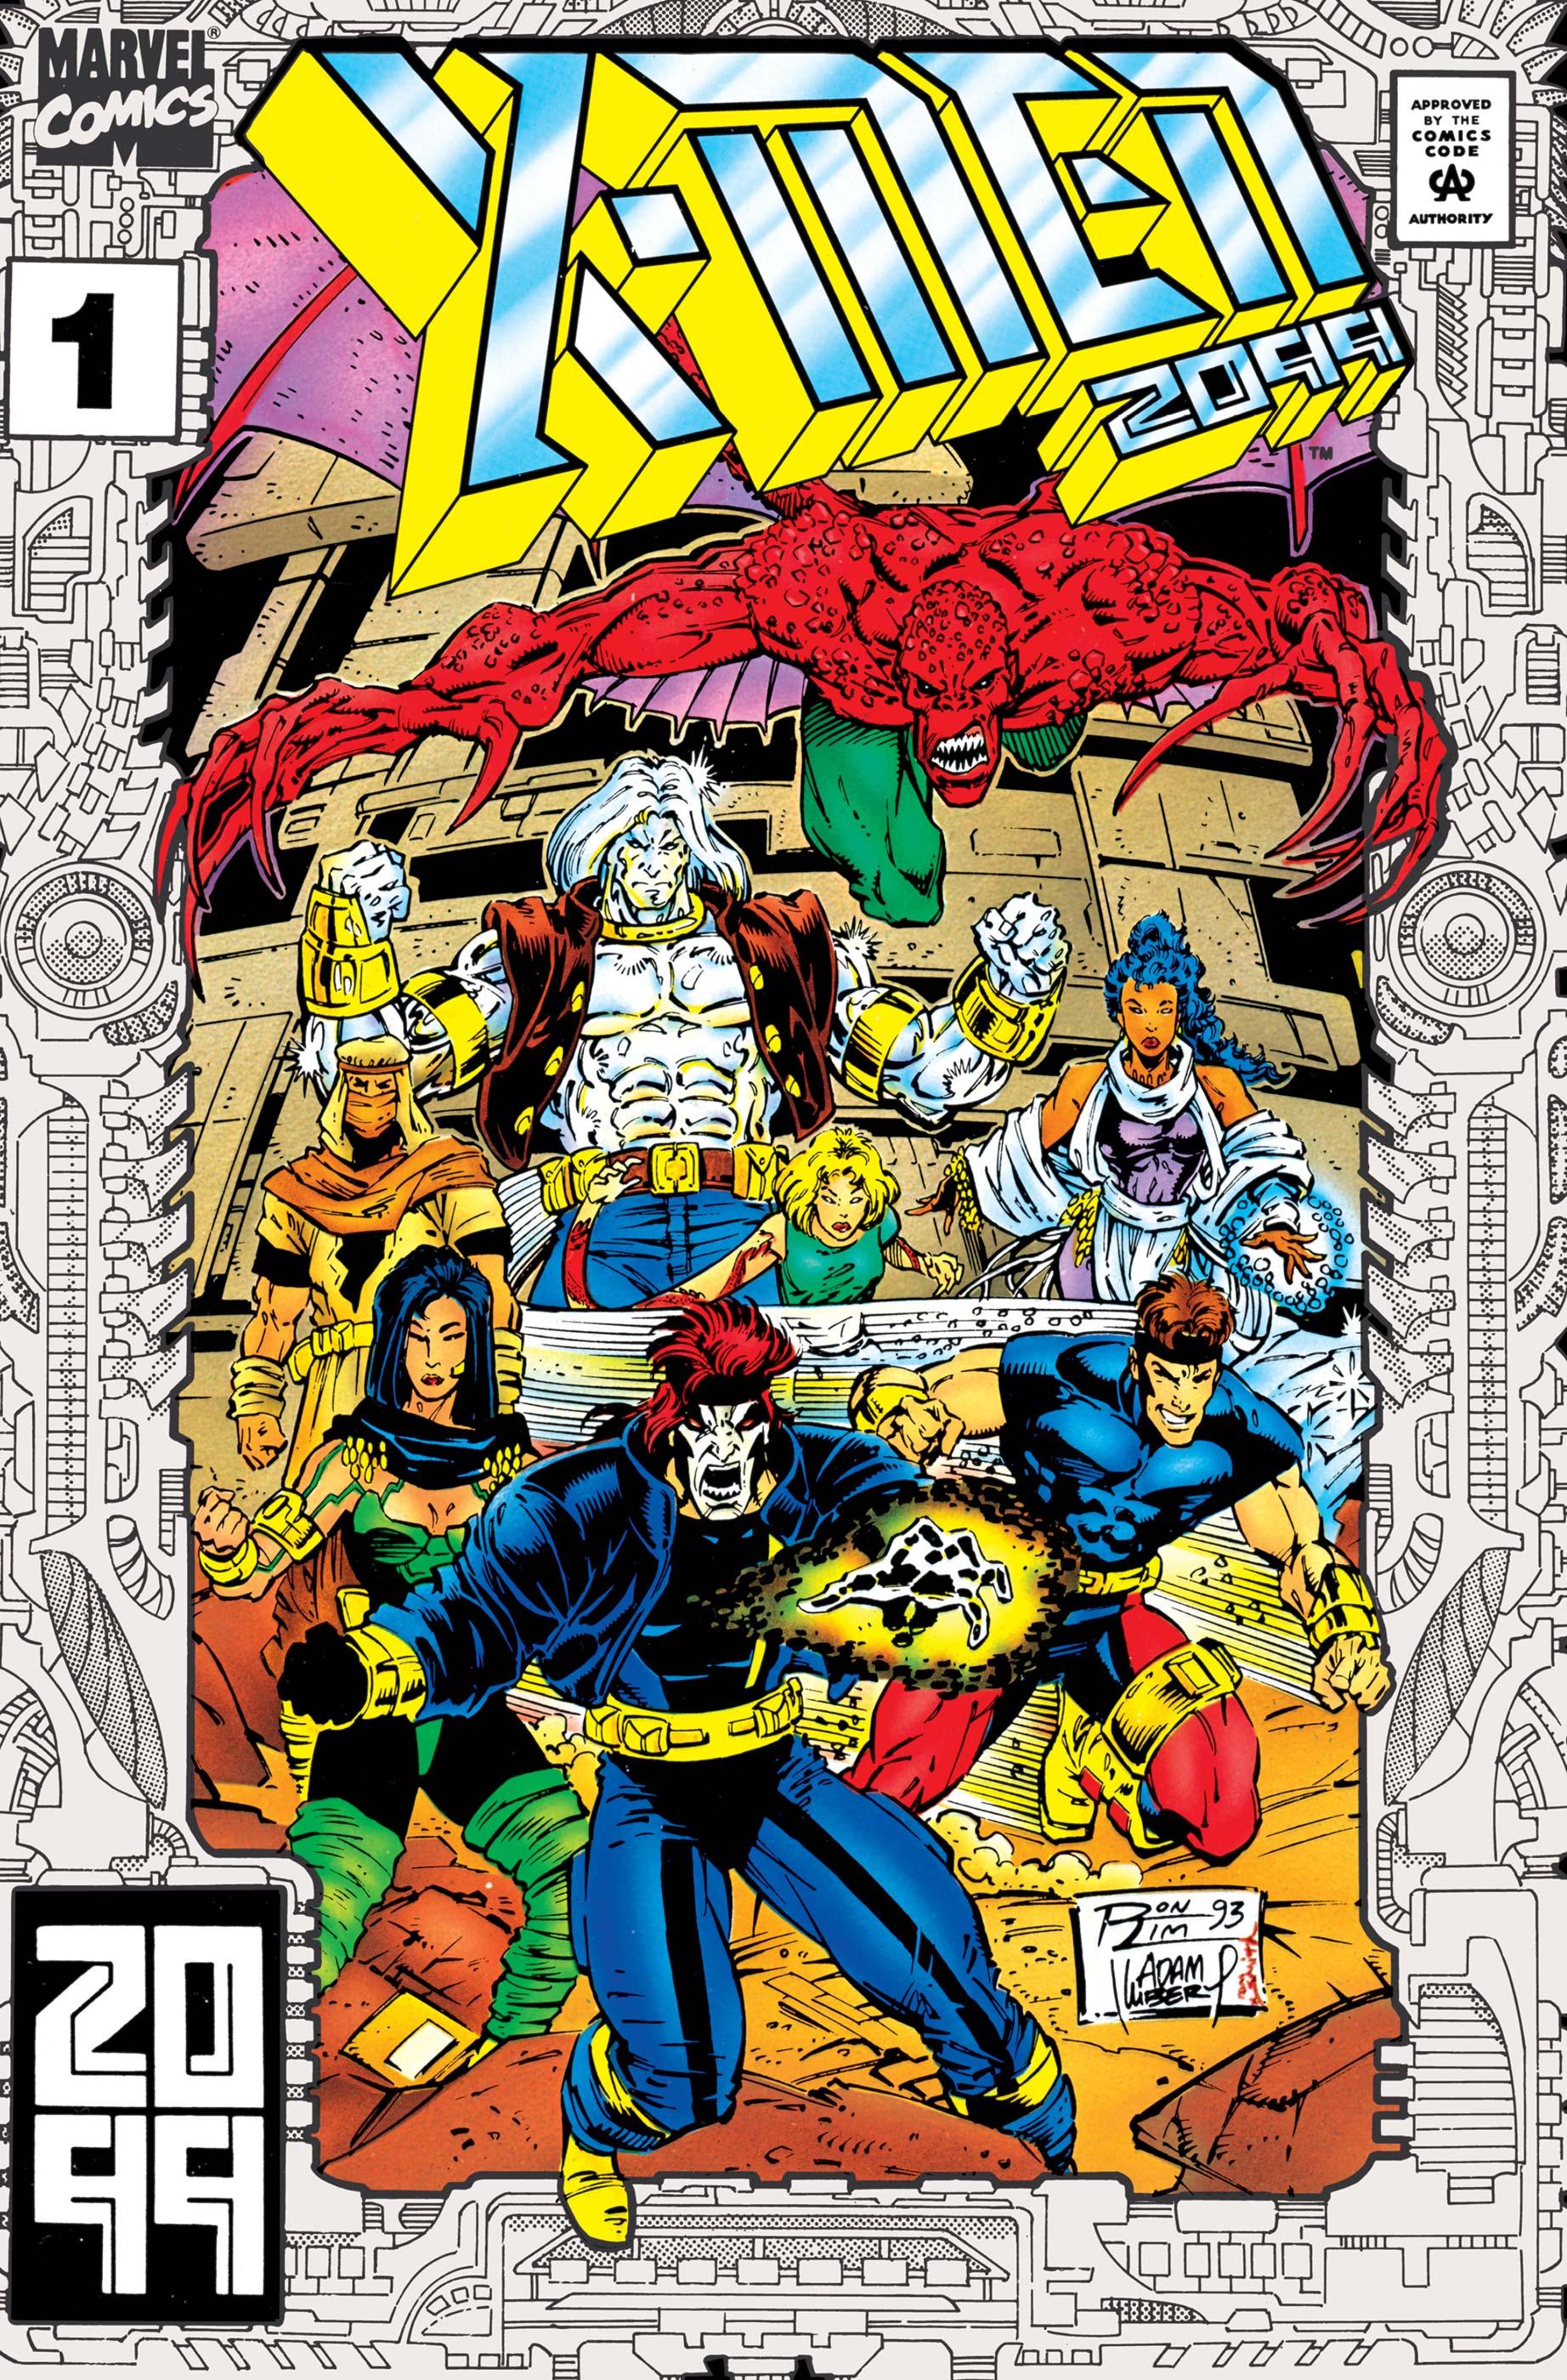 X-Men 2099 (1993) #1